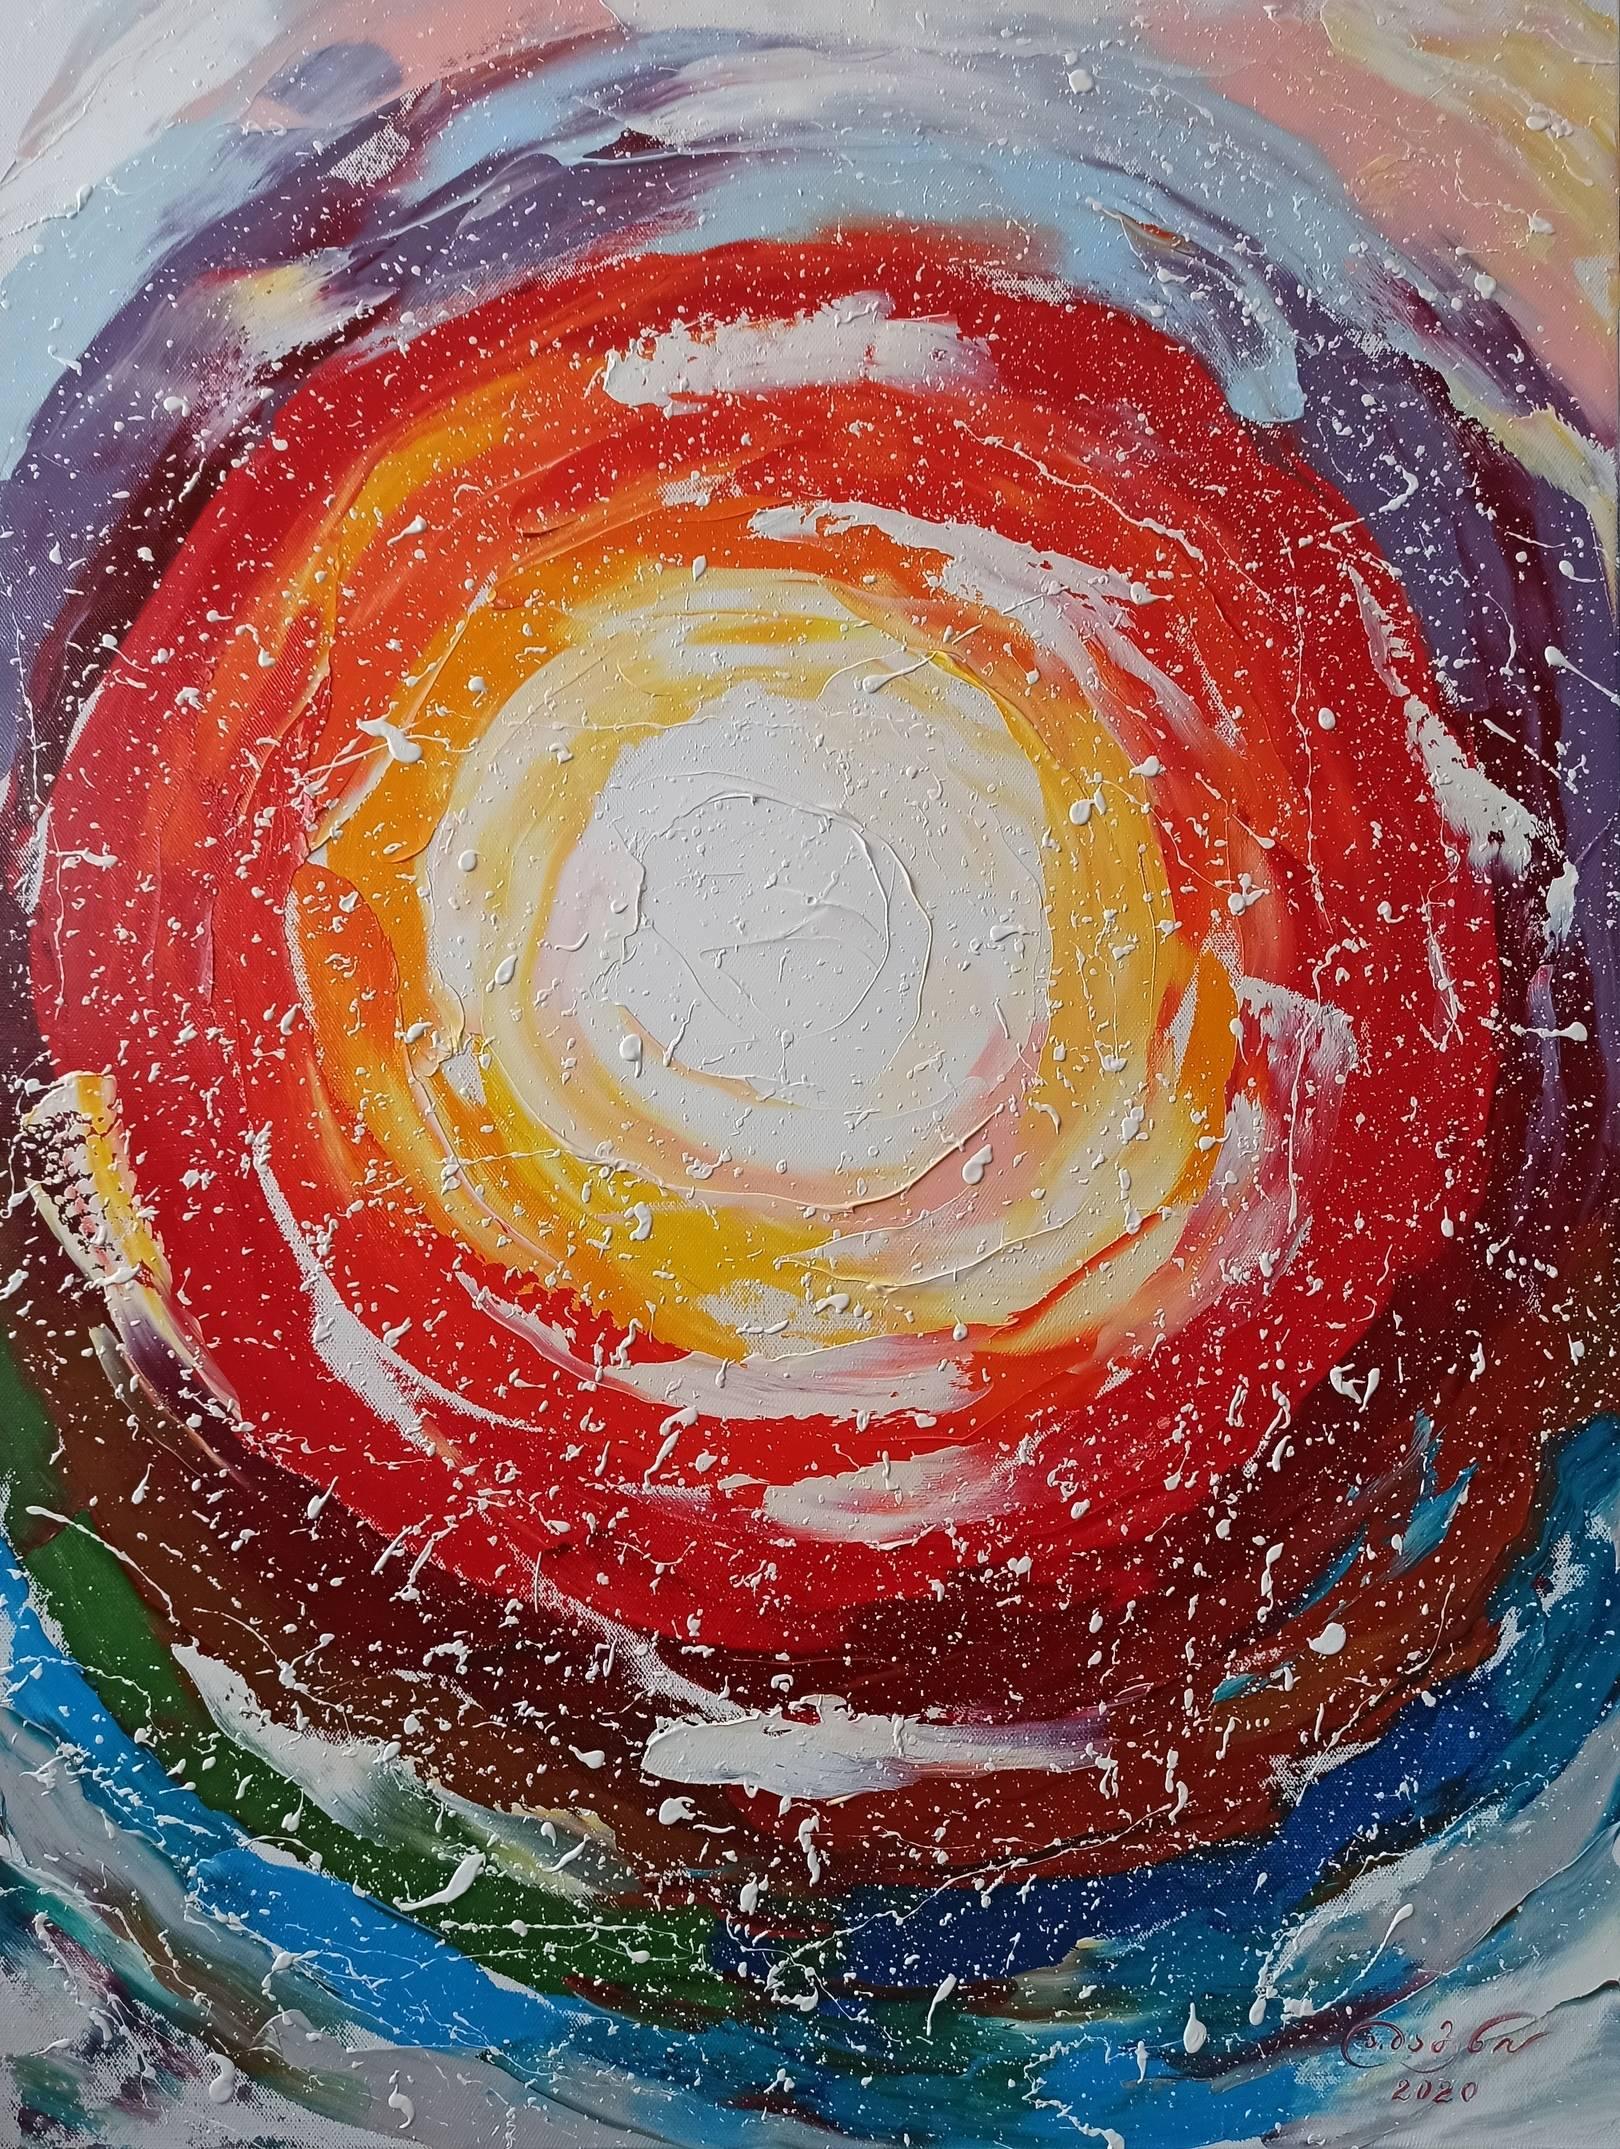 «Космическая пульсация - Сияние» холст, масло «Cosmic Ripple - Radiance» oil on canvas  80x60, 2020